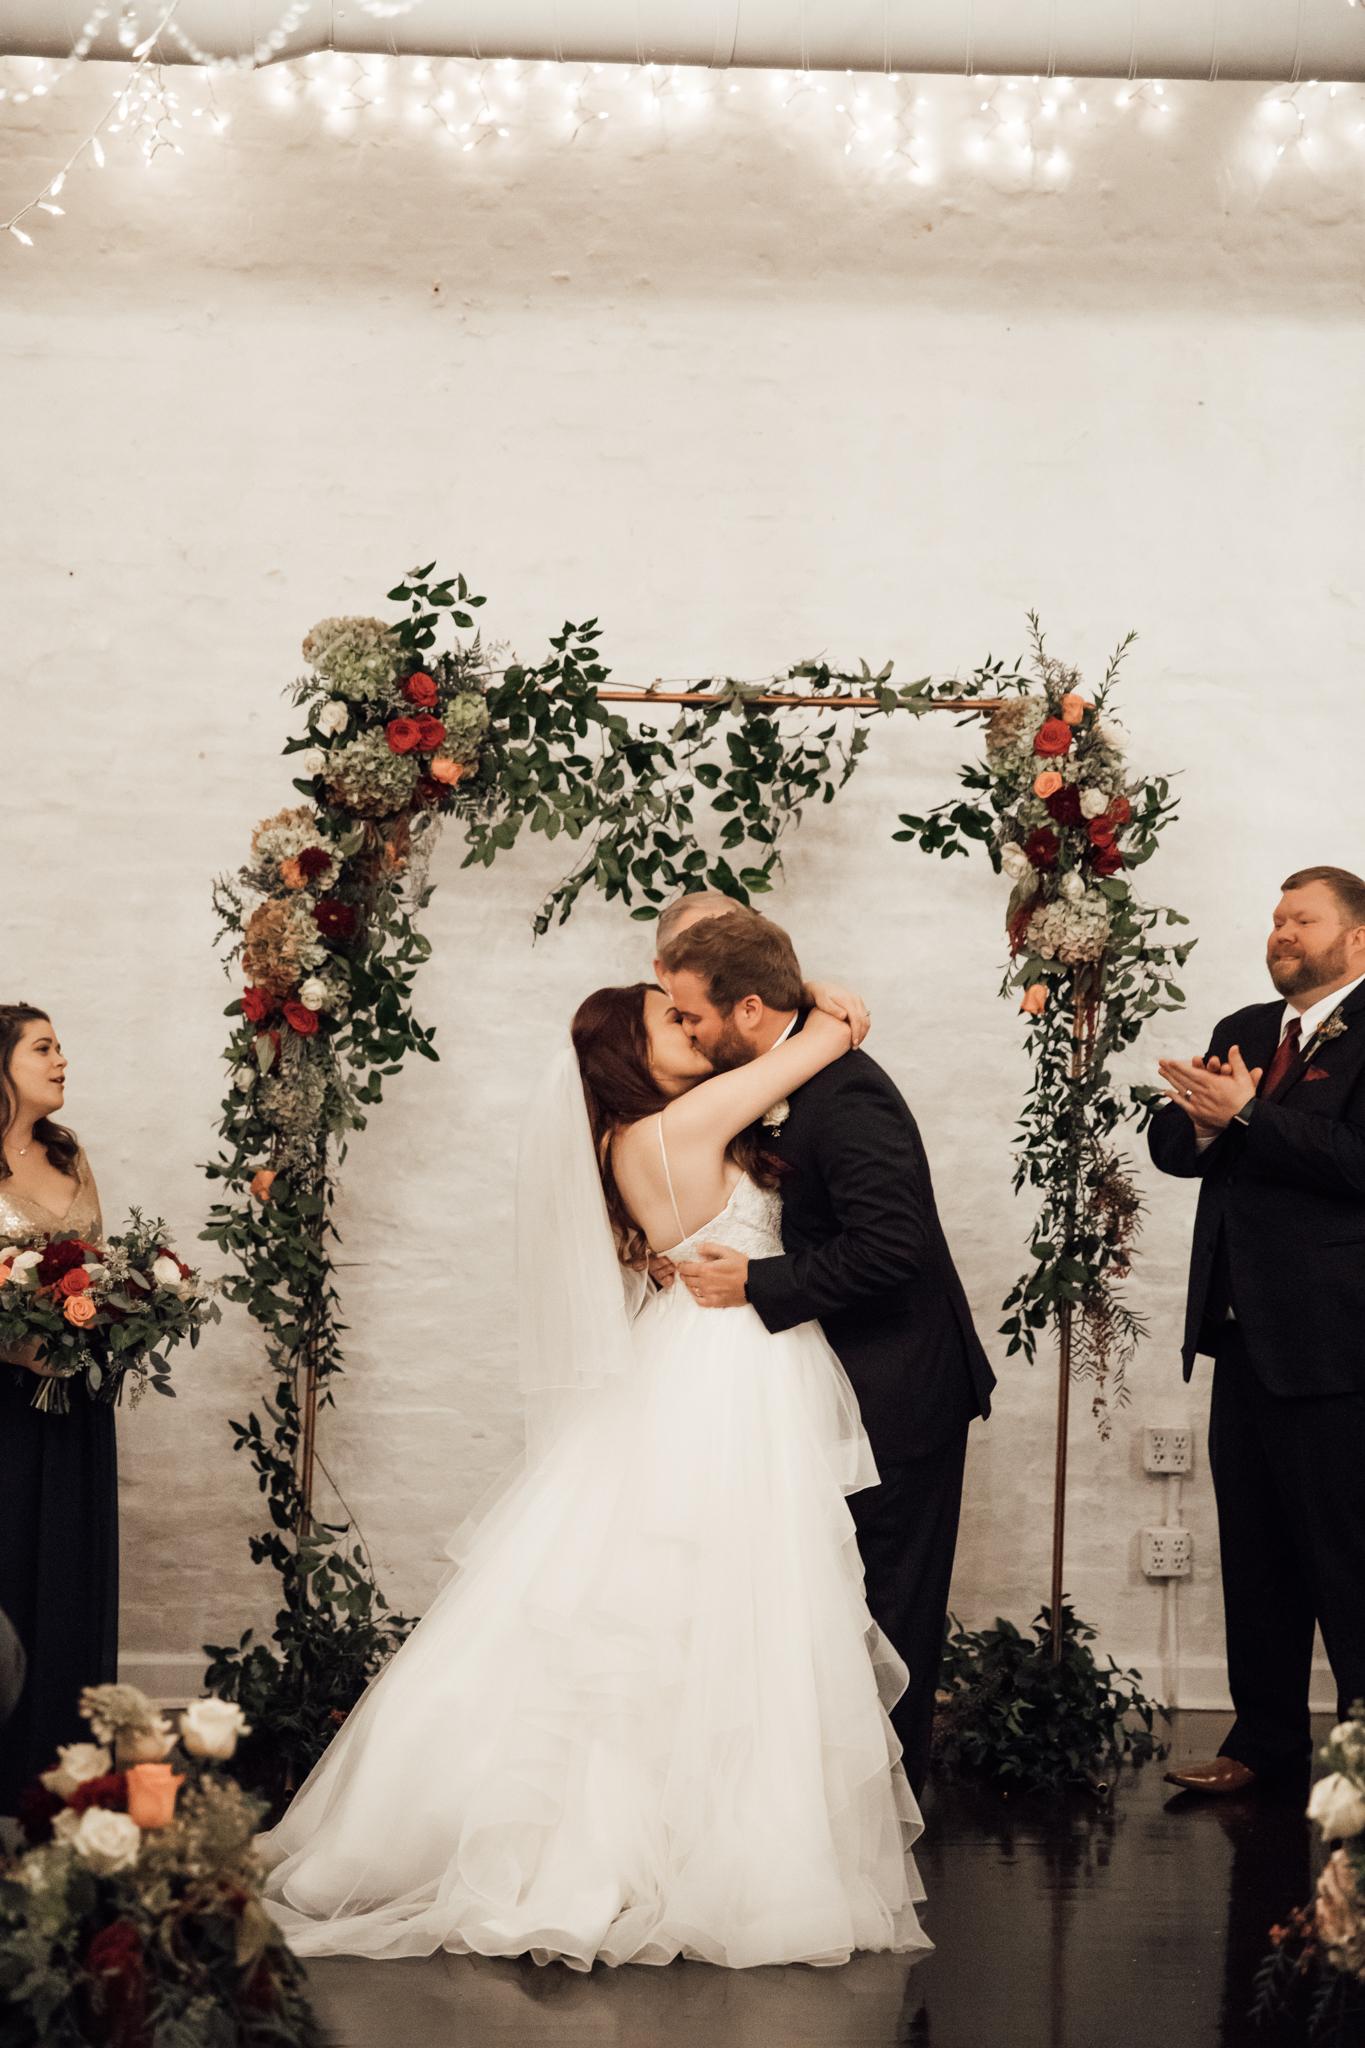 memphis-wedding-photographers-thewarmtharoundyou-ballinese-ballroom (157 of 232).jpg